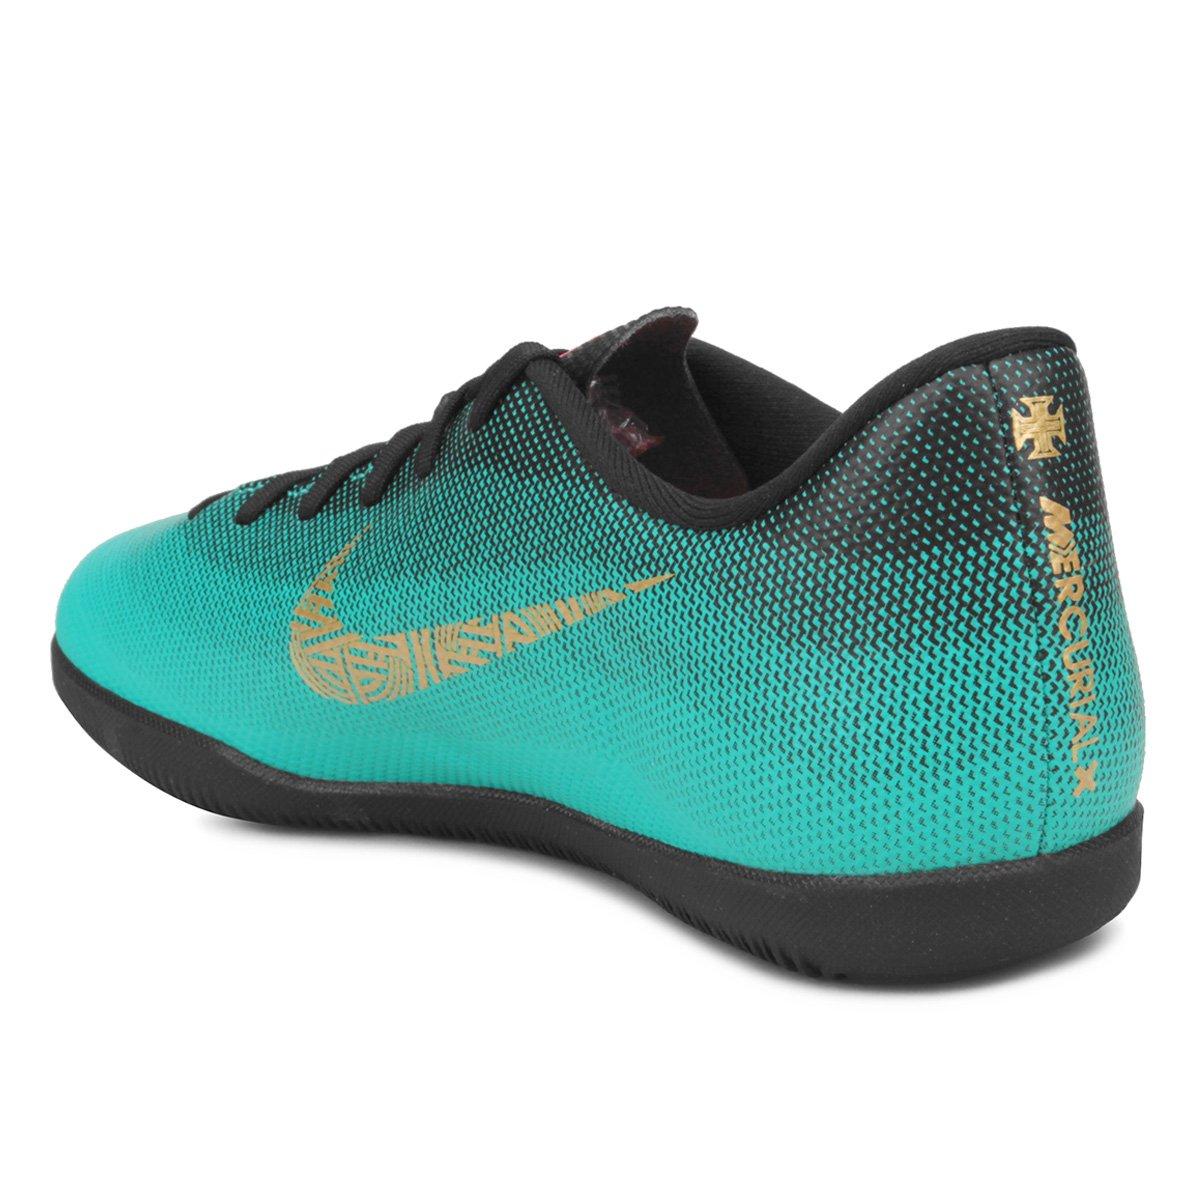 fe175937efb79 Mercurial Nike Club Infantil Ic Vapor Chuteira Futsal Cr7 Gs 12 pTatx4qn